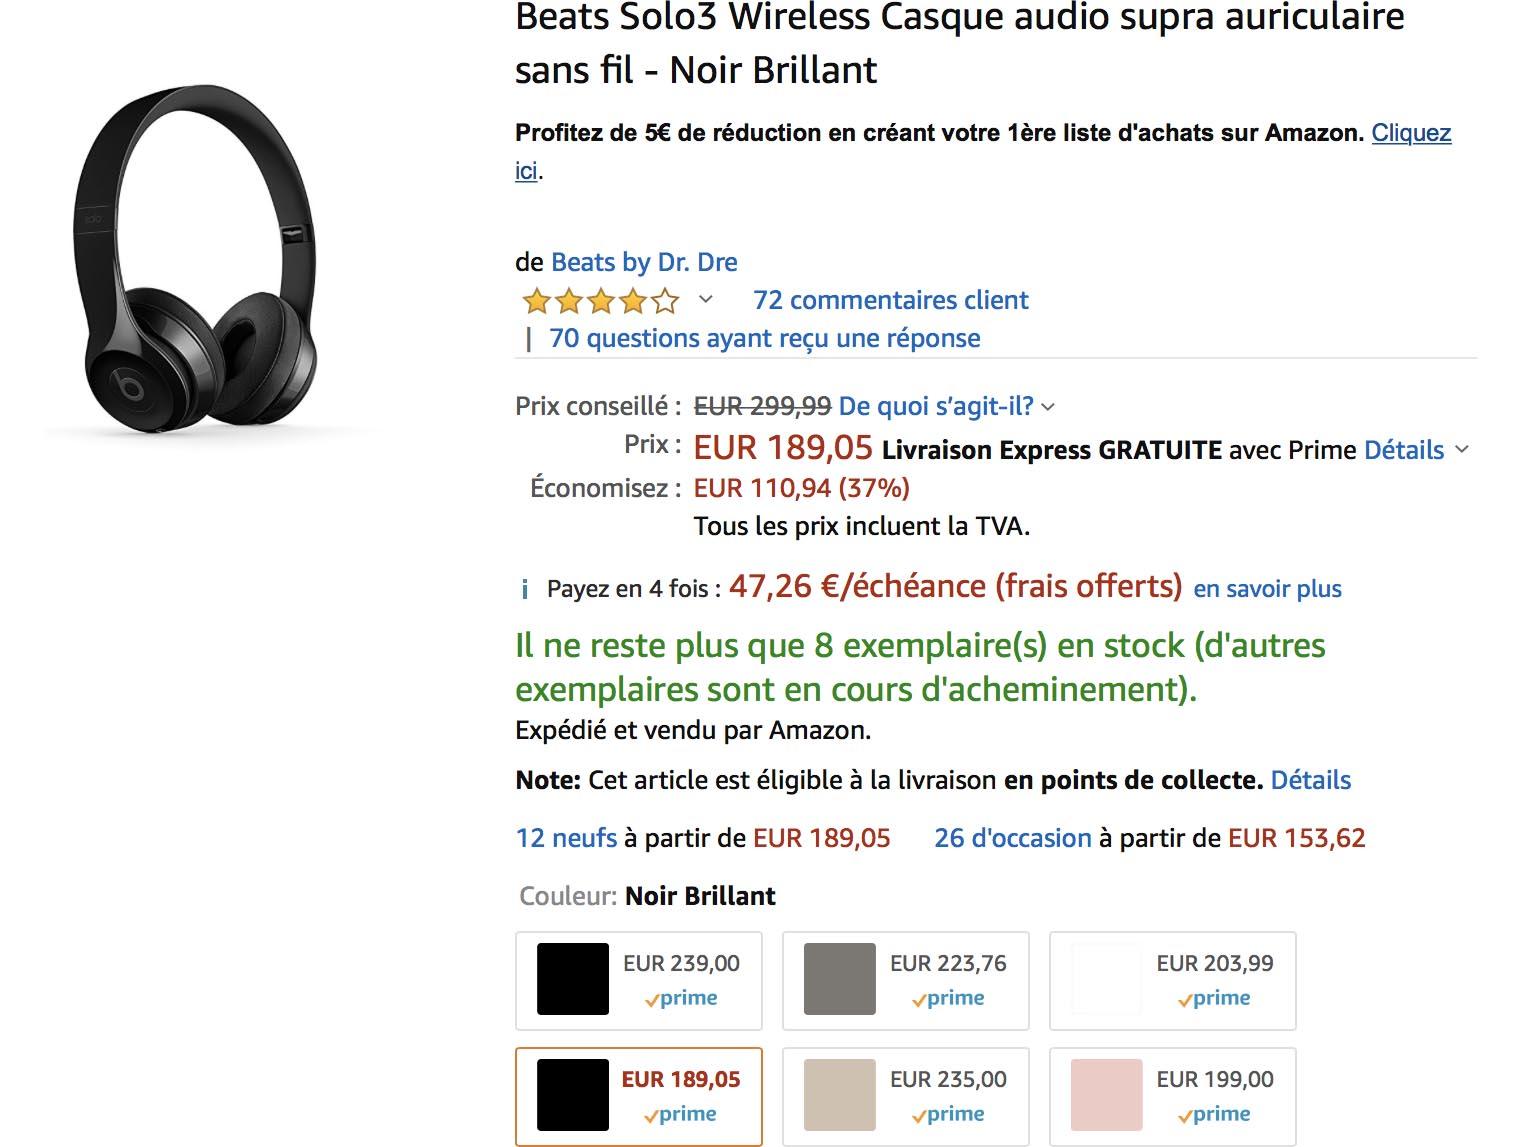 Promo Solo3 Beats Amazon